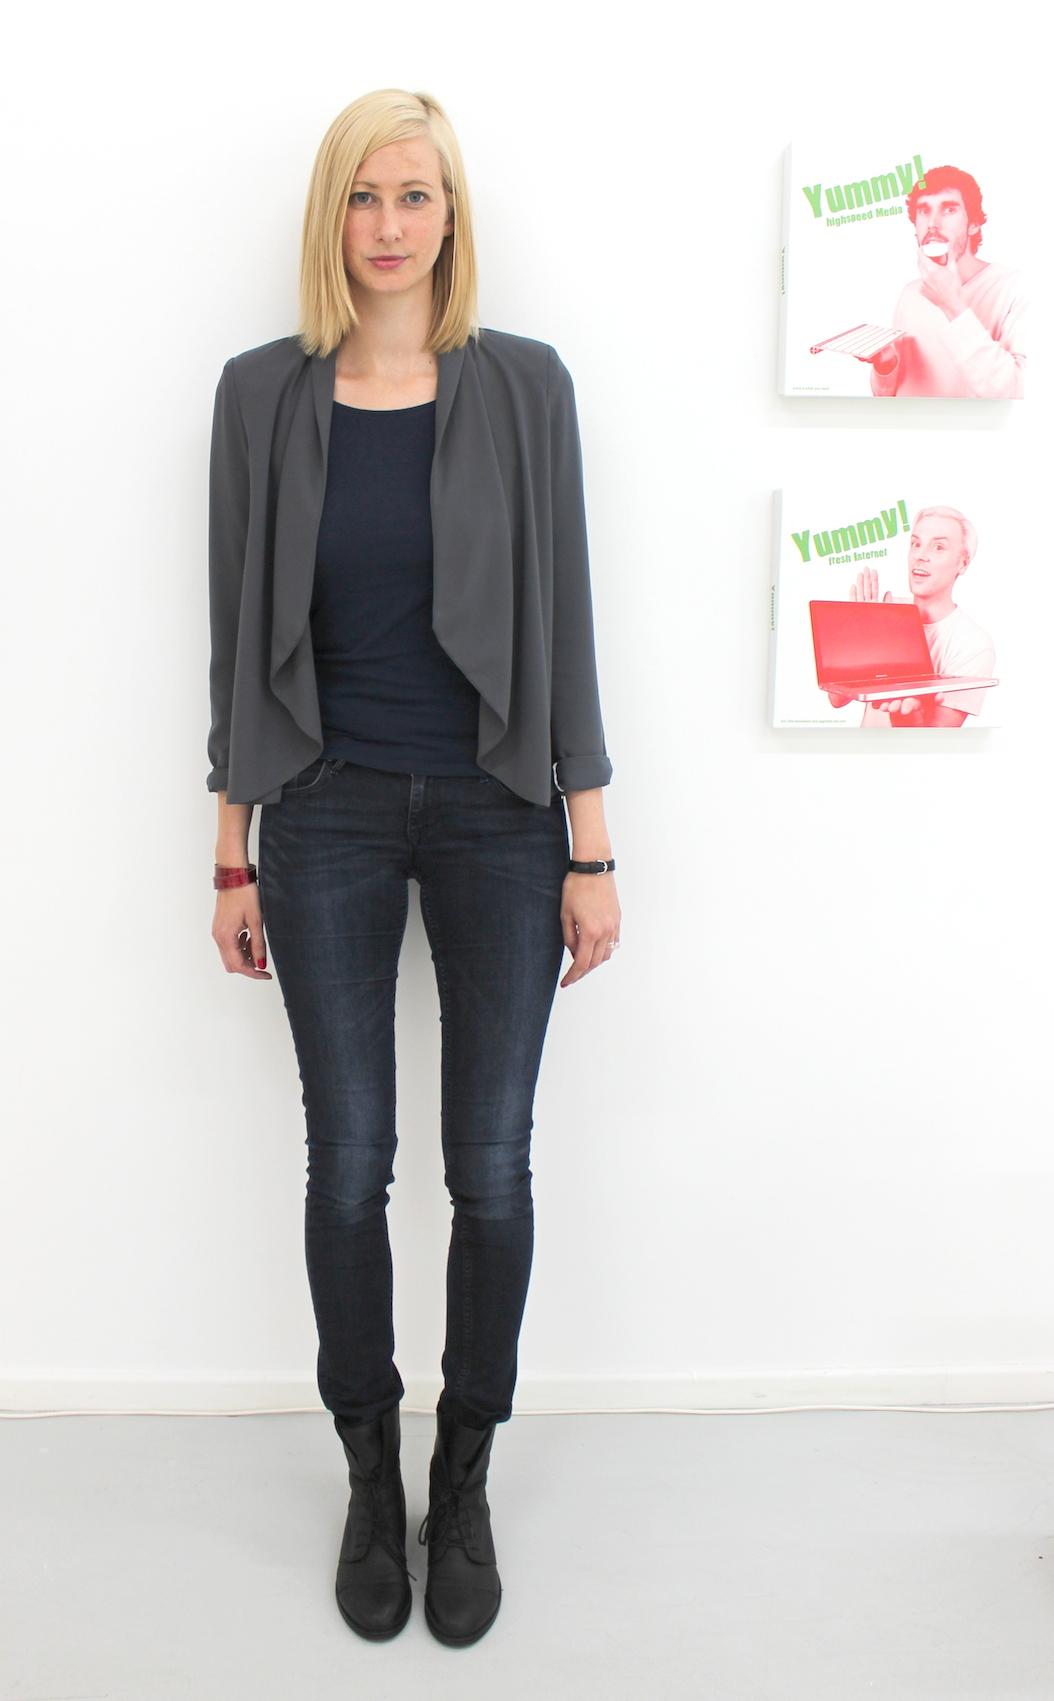 Tina Sauerlaender_(c) Melina Volkmann, 2015